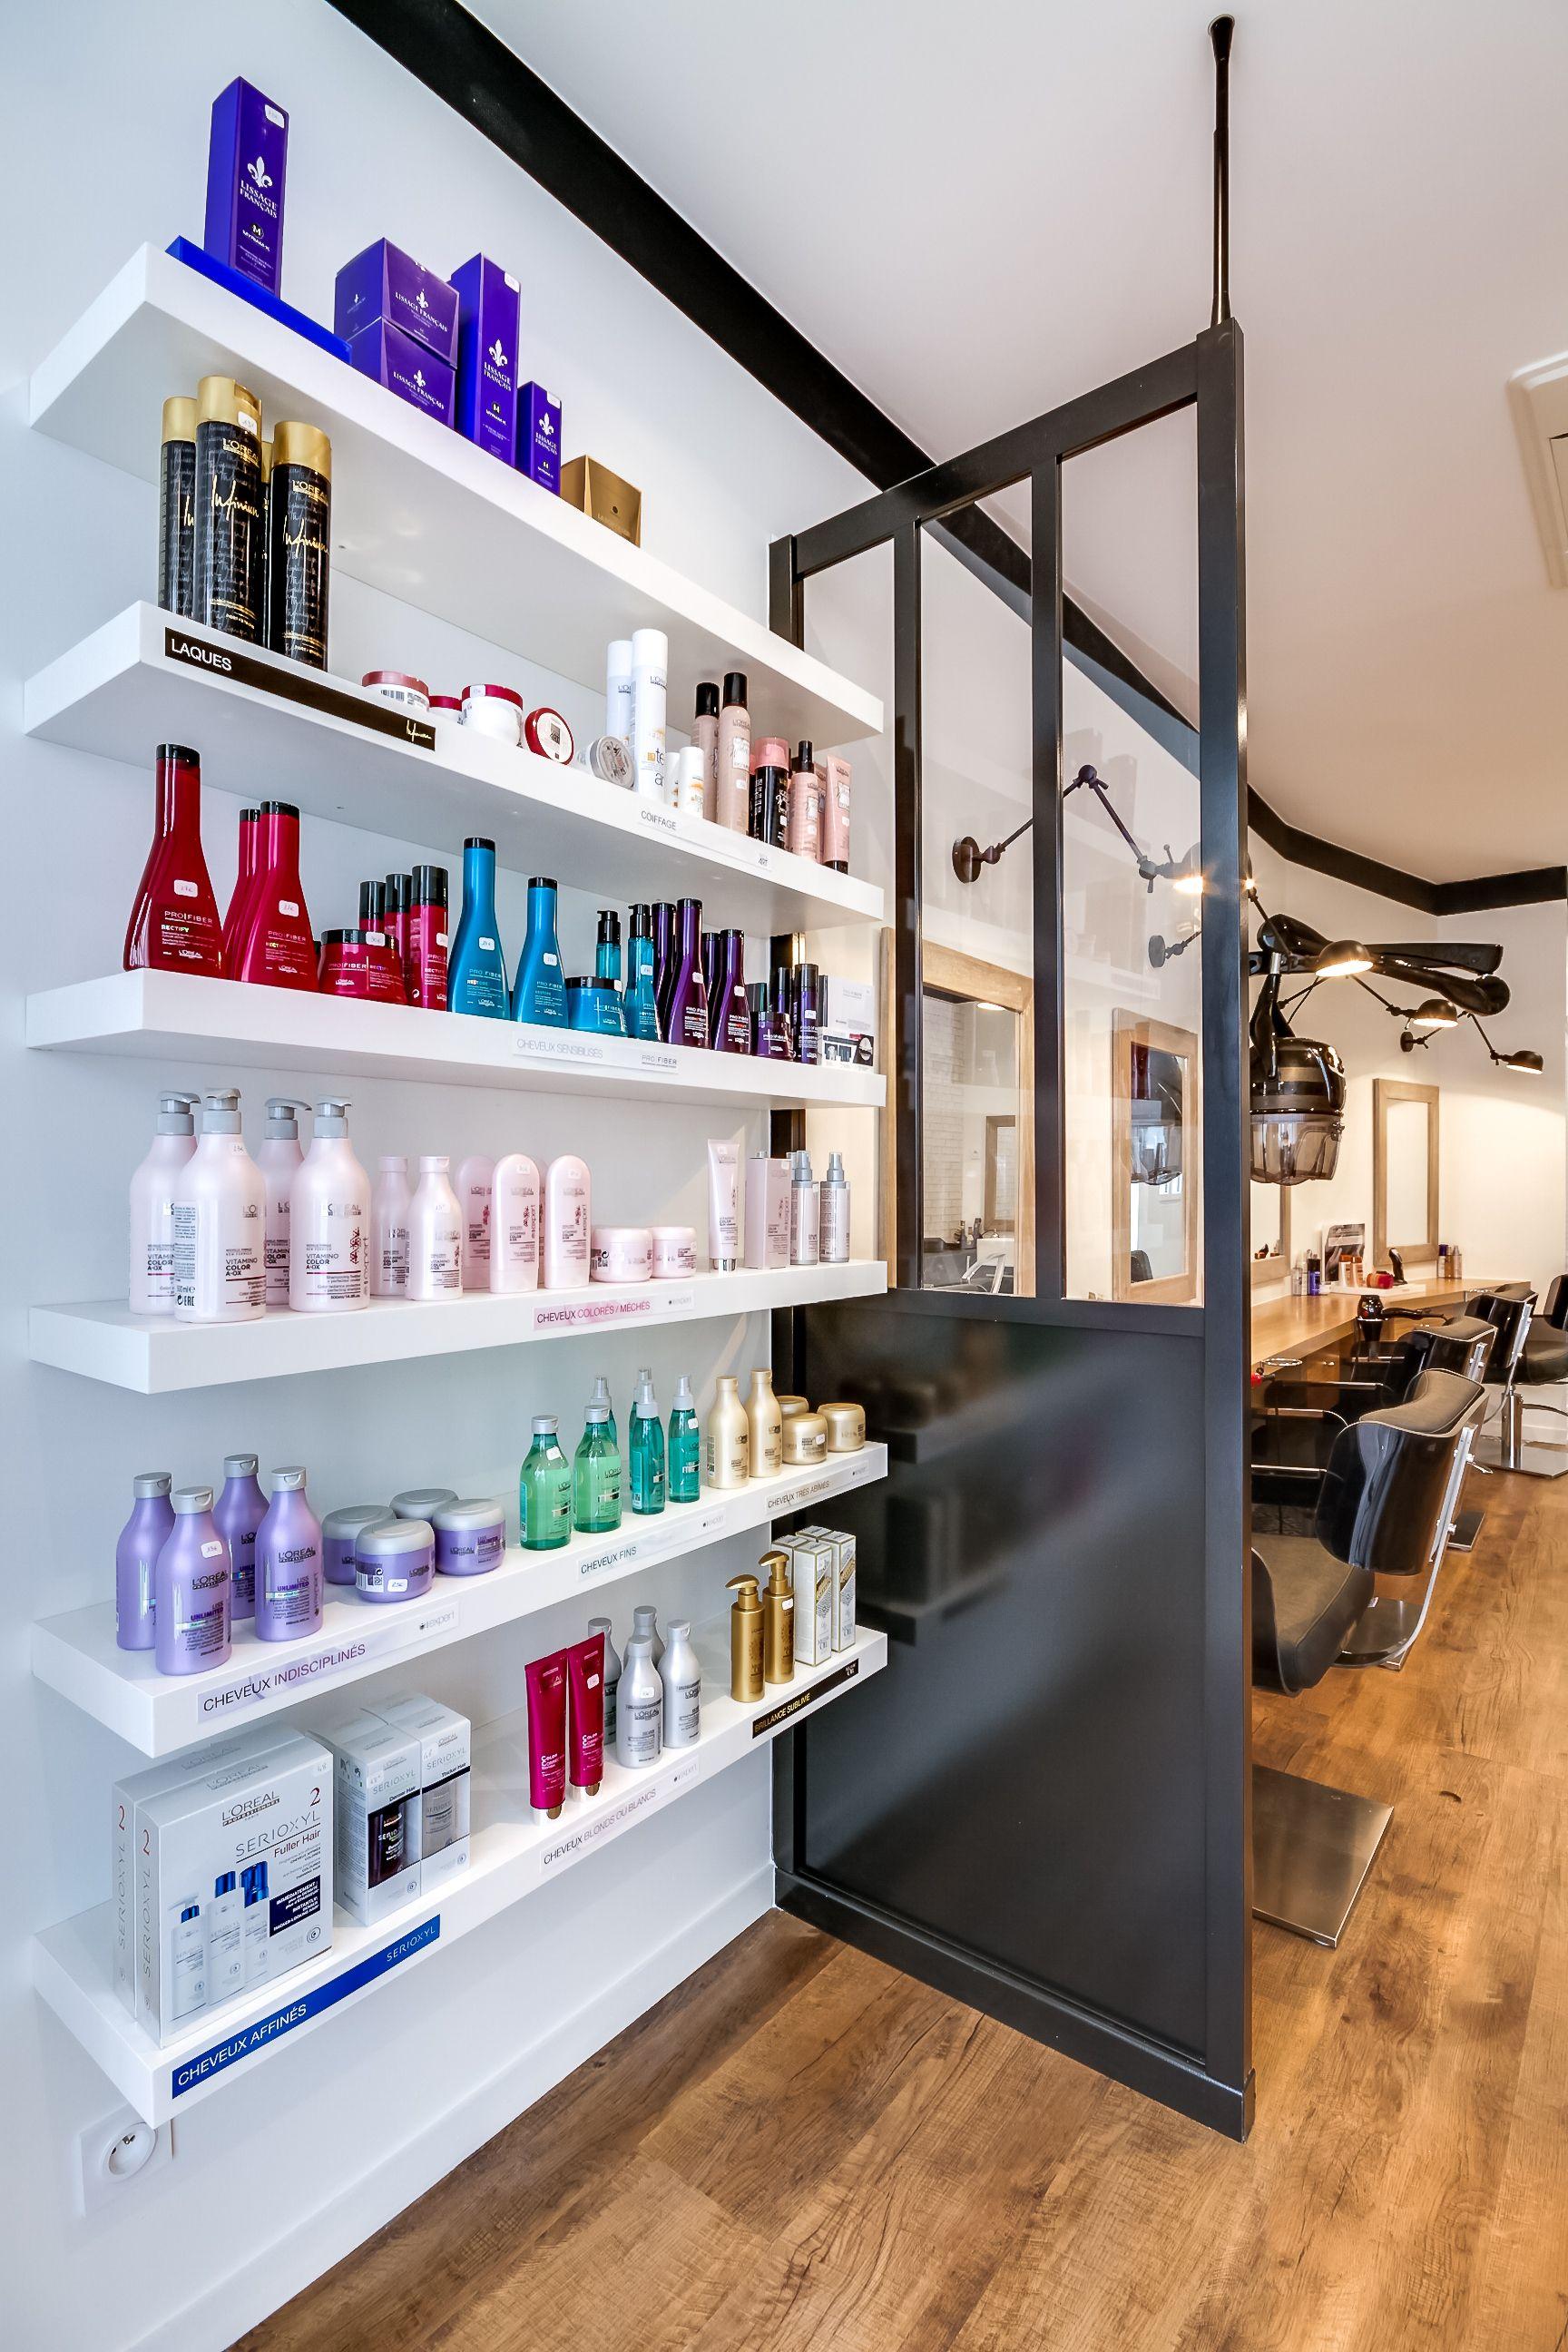 Rnovation totale dun Salon de coiffure Paris Espace retail revente Agence Dco At Ome Dco